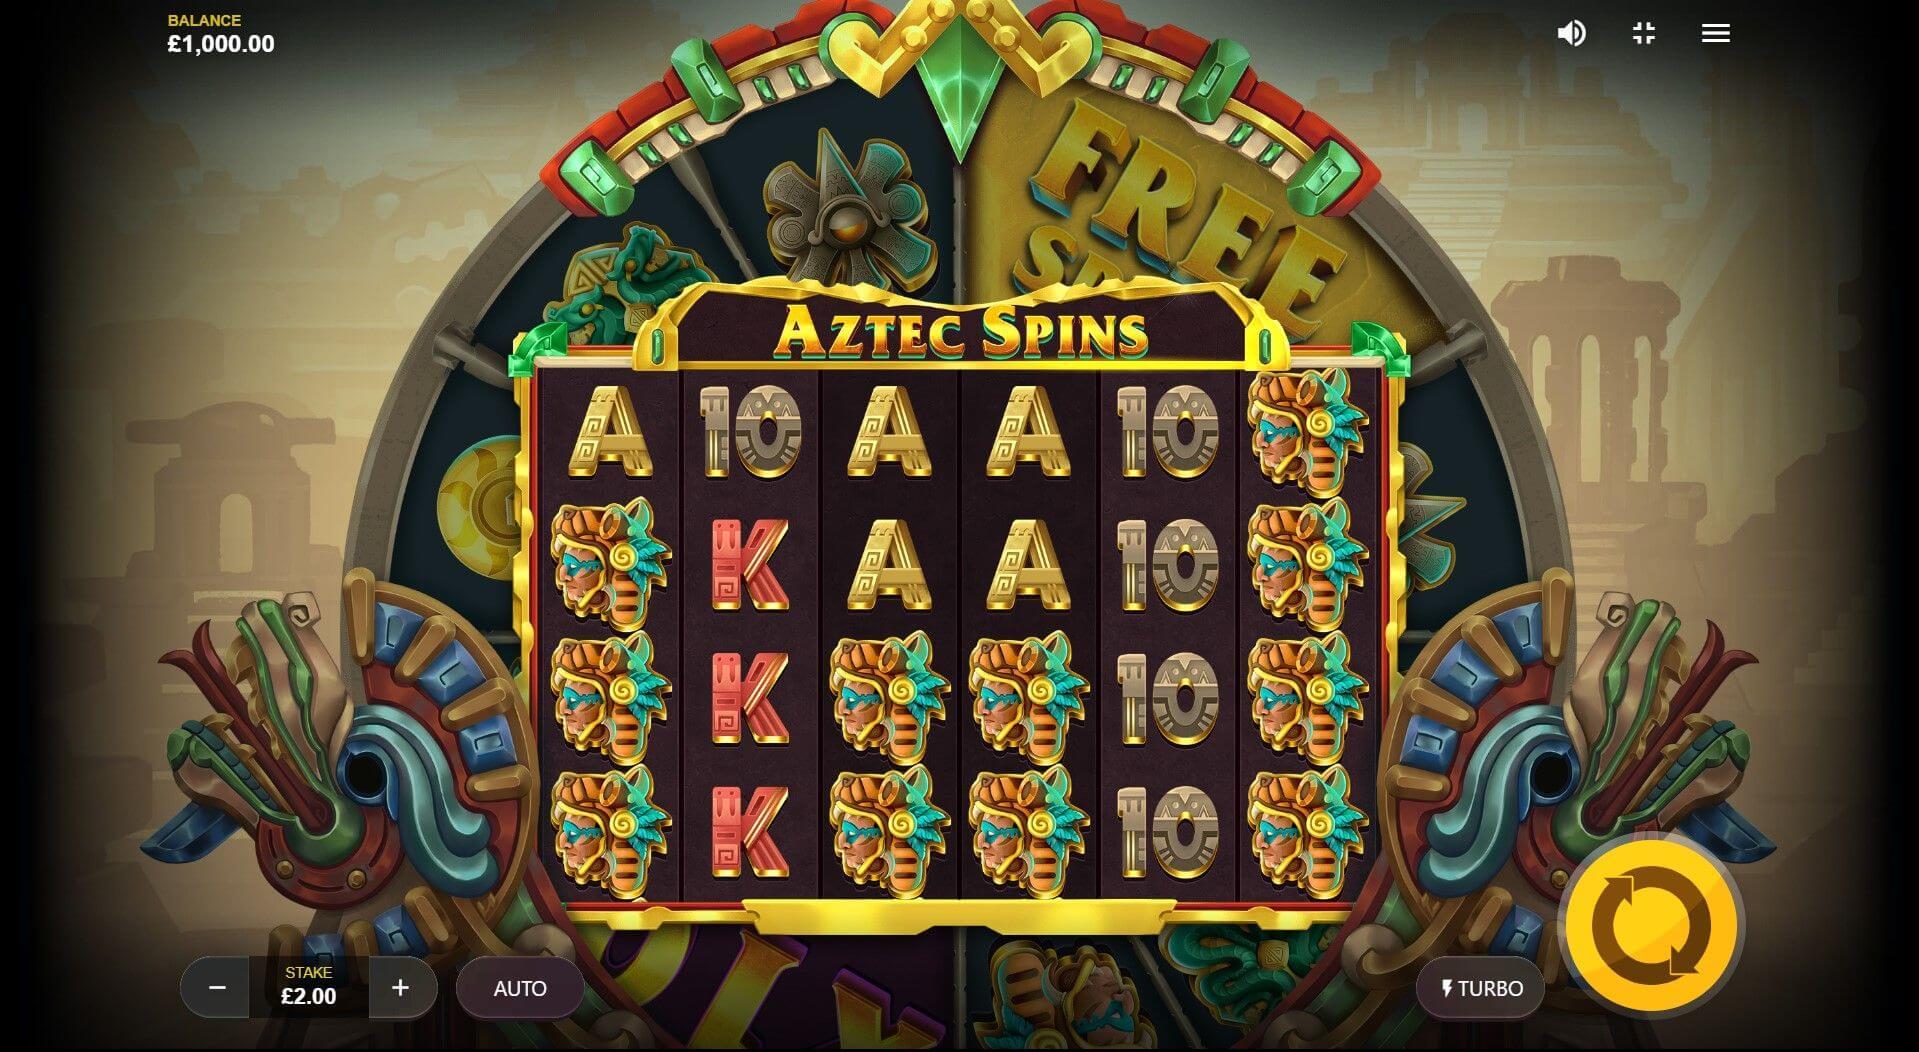 Aztec Spins Slot Gameplay